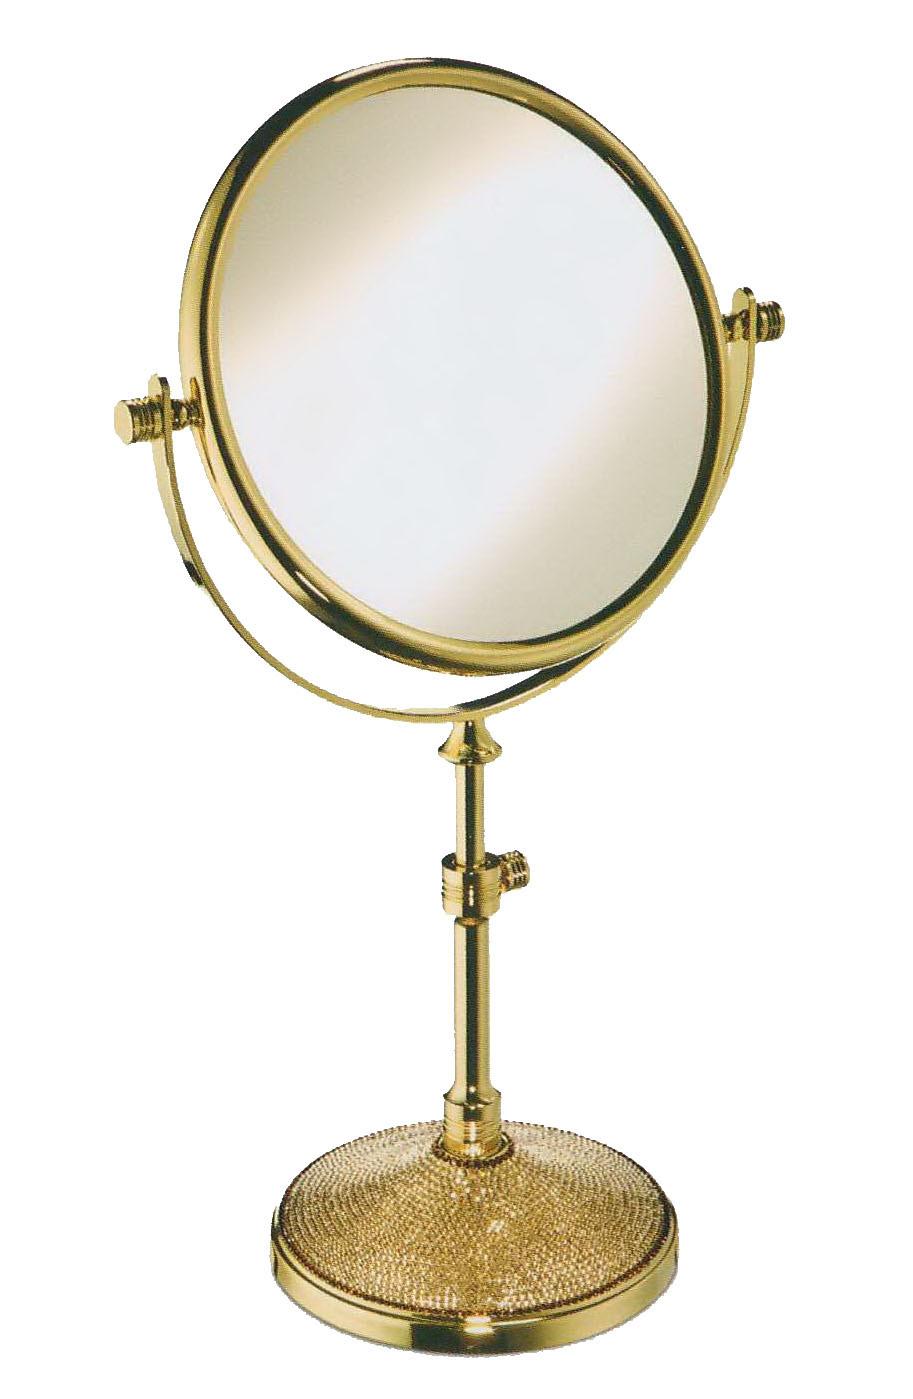 Зеркала Зеркало косметическое Windisch 99532O 5X Starlight elitnoe-zerkalo-kosmeticheskoe-99532o-3x-starlight-ot-windisch-ispaniya.jpg